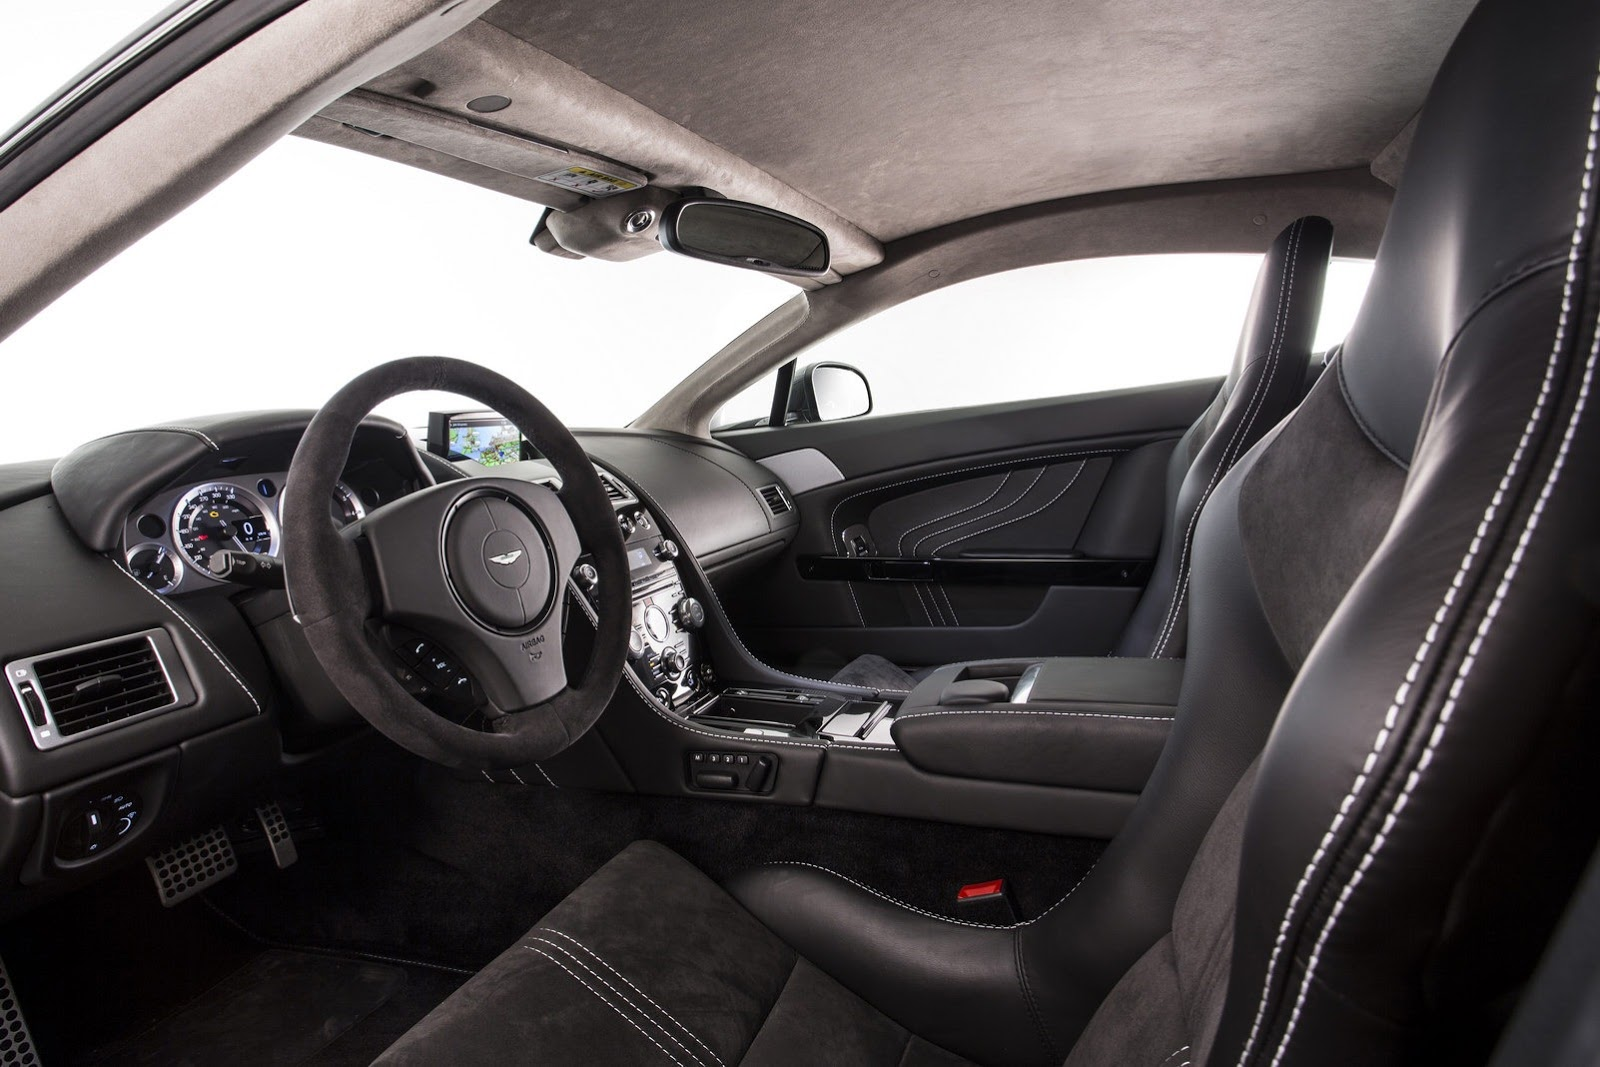 Aston-Martin-SP10-Interior